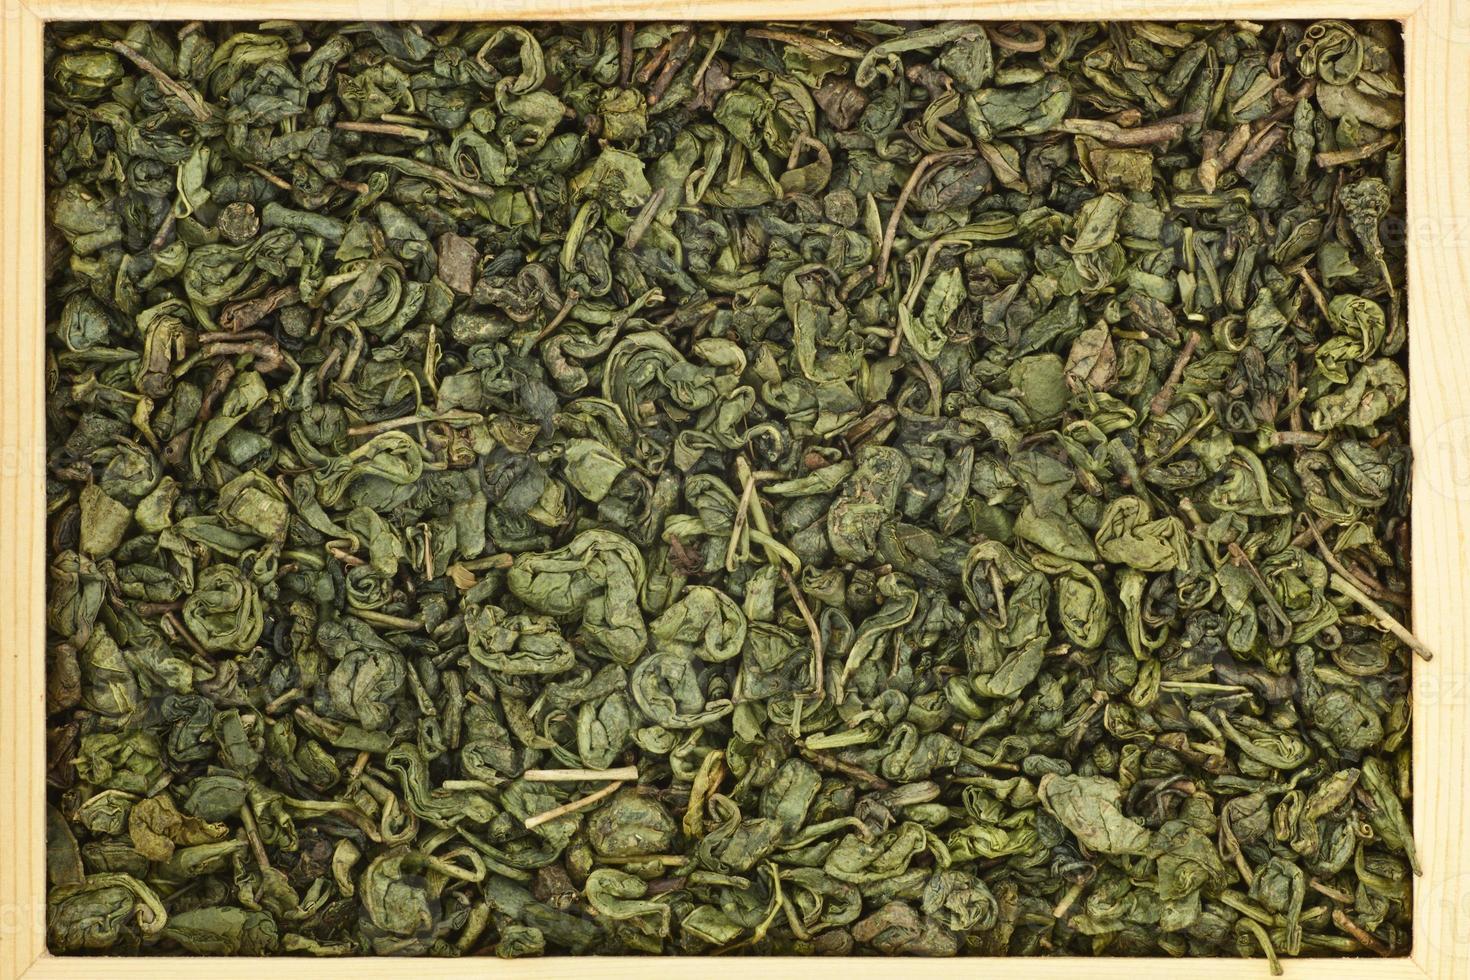 té verde chino foto